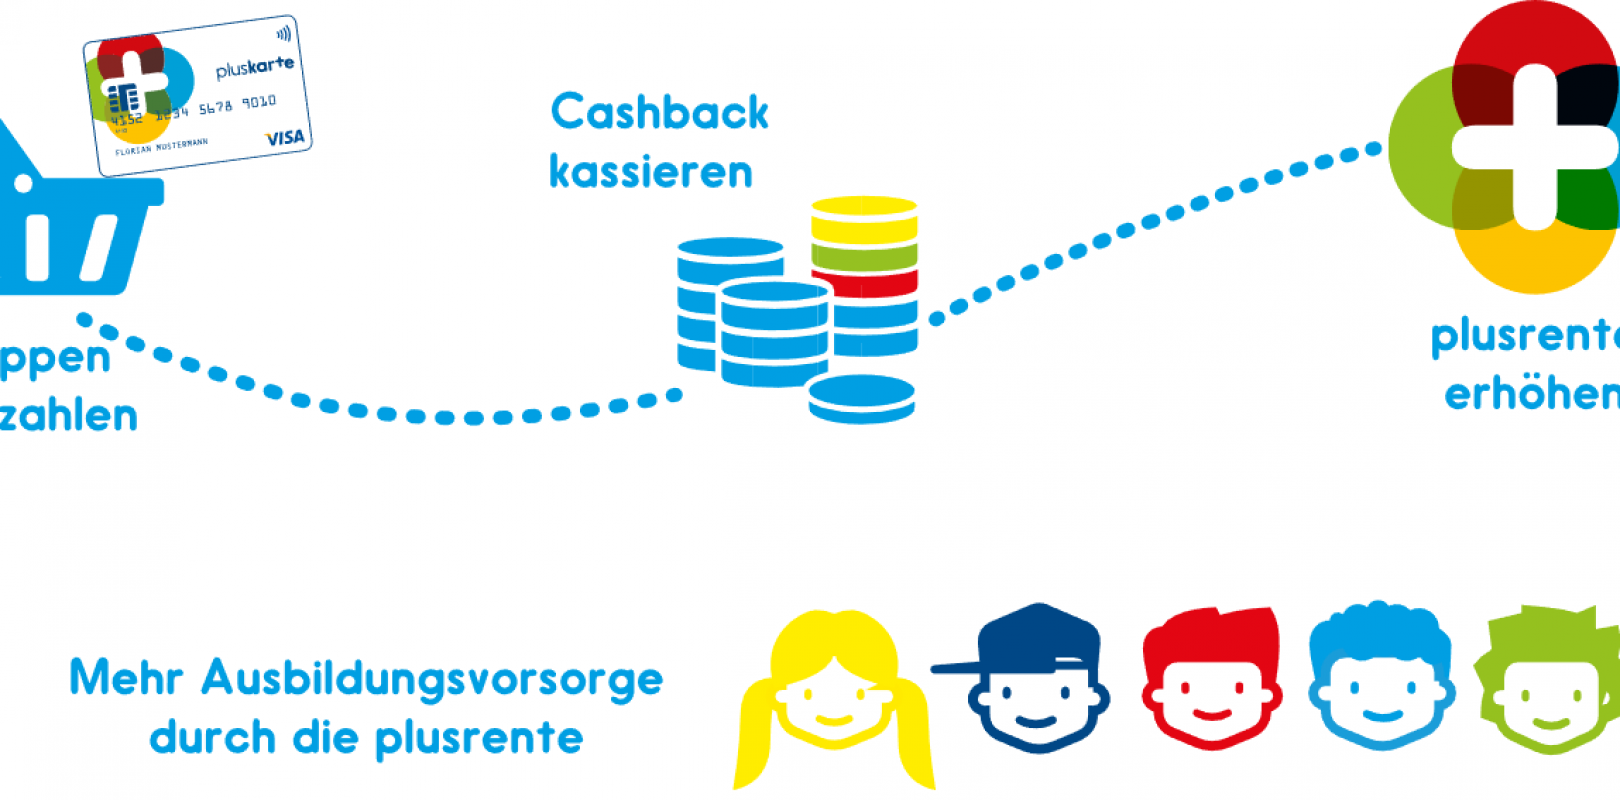 Bild Cashback bei der Altersvorsorge unserer Kinder